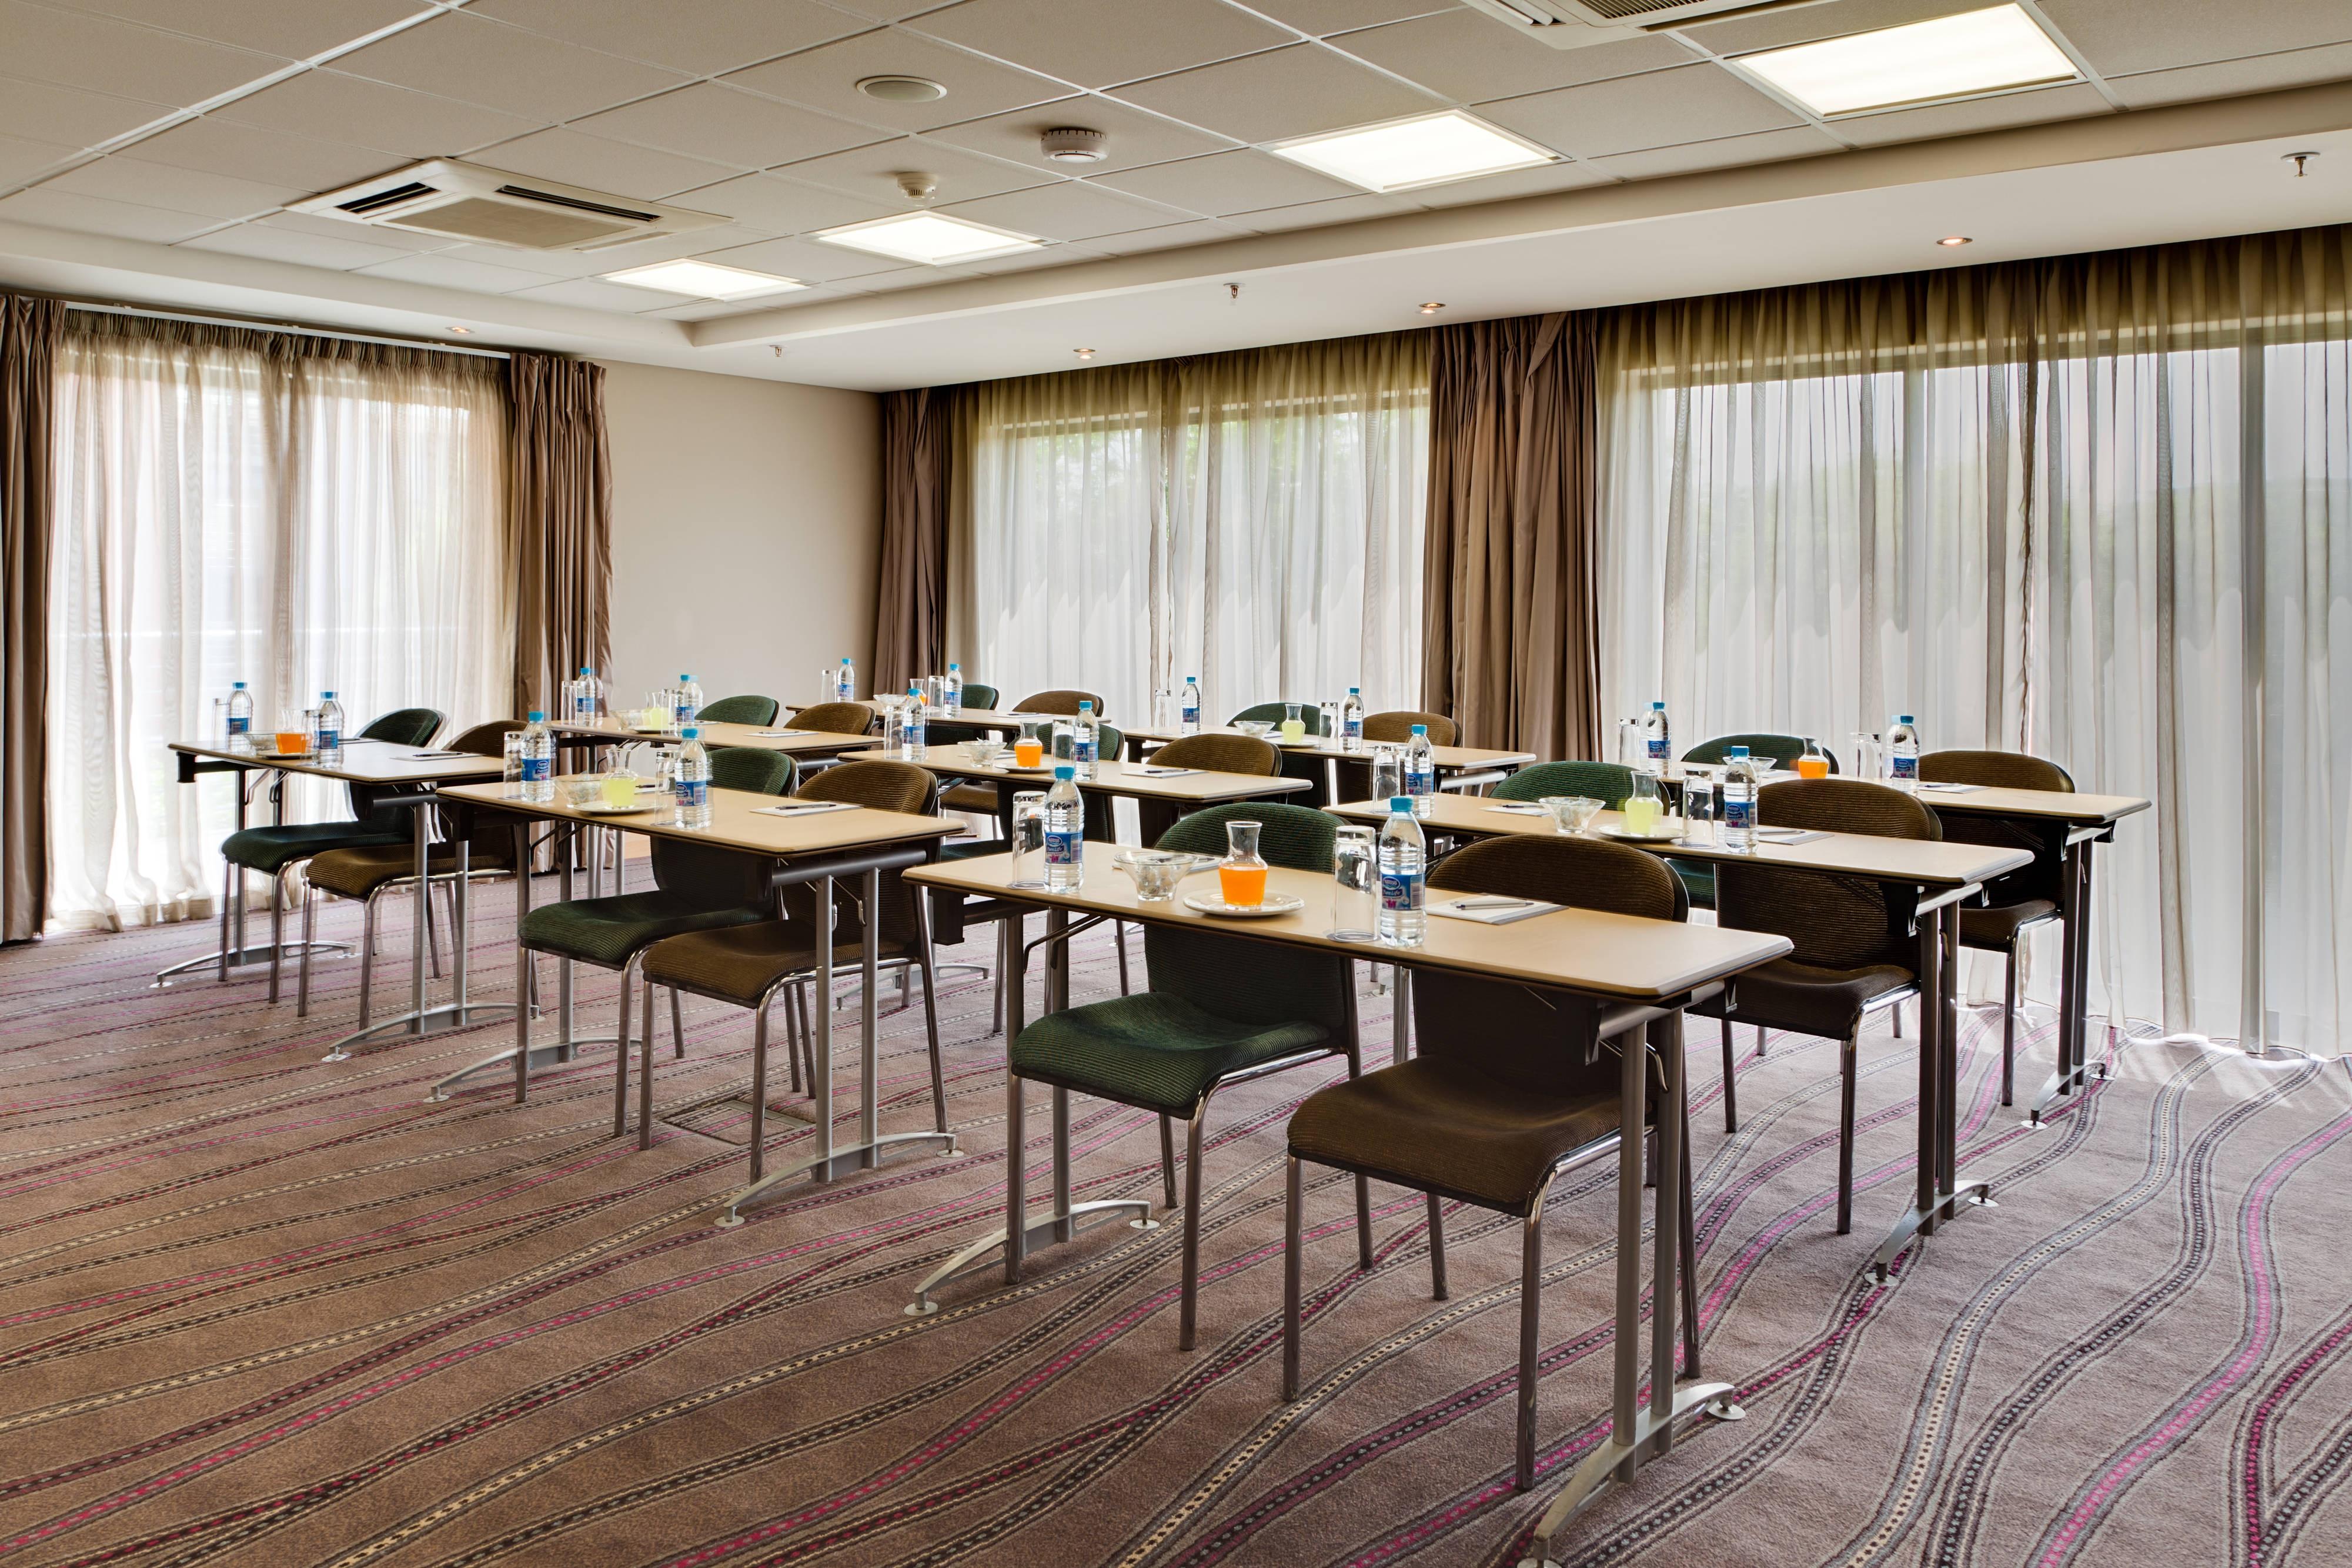 Salle de conférence–configuration salle de classe